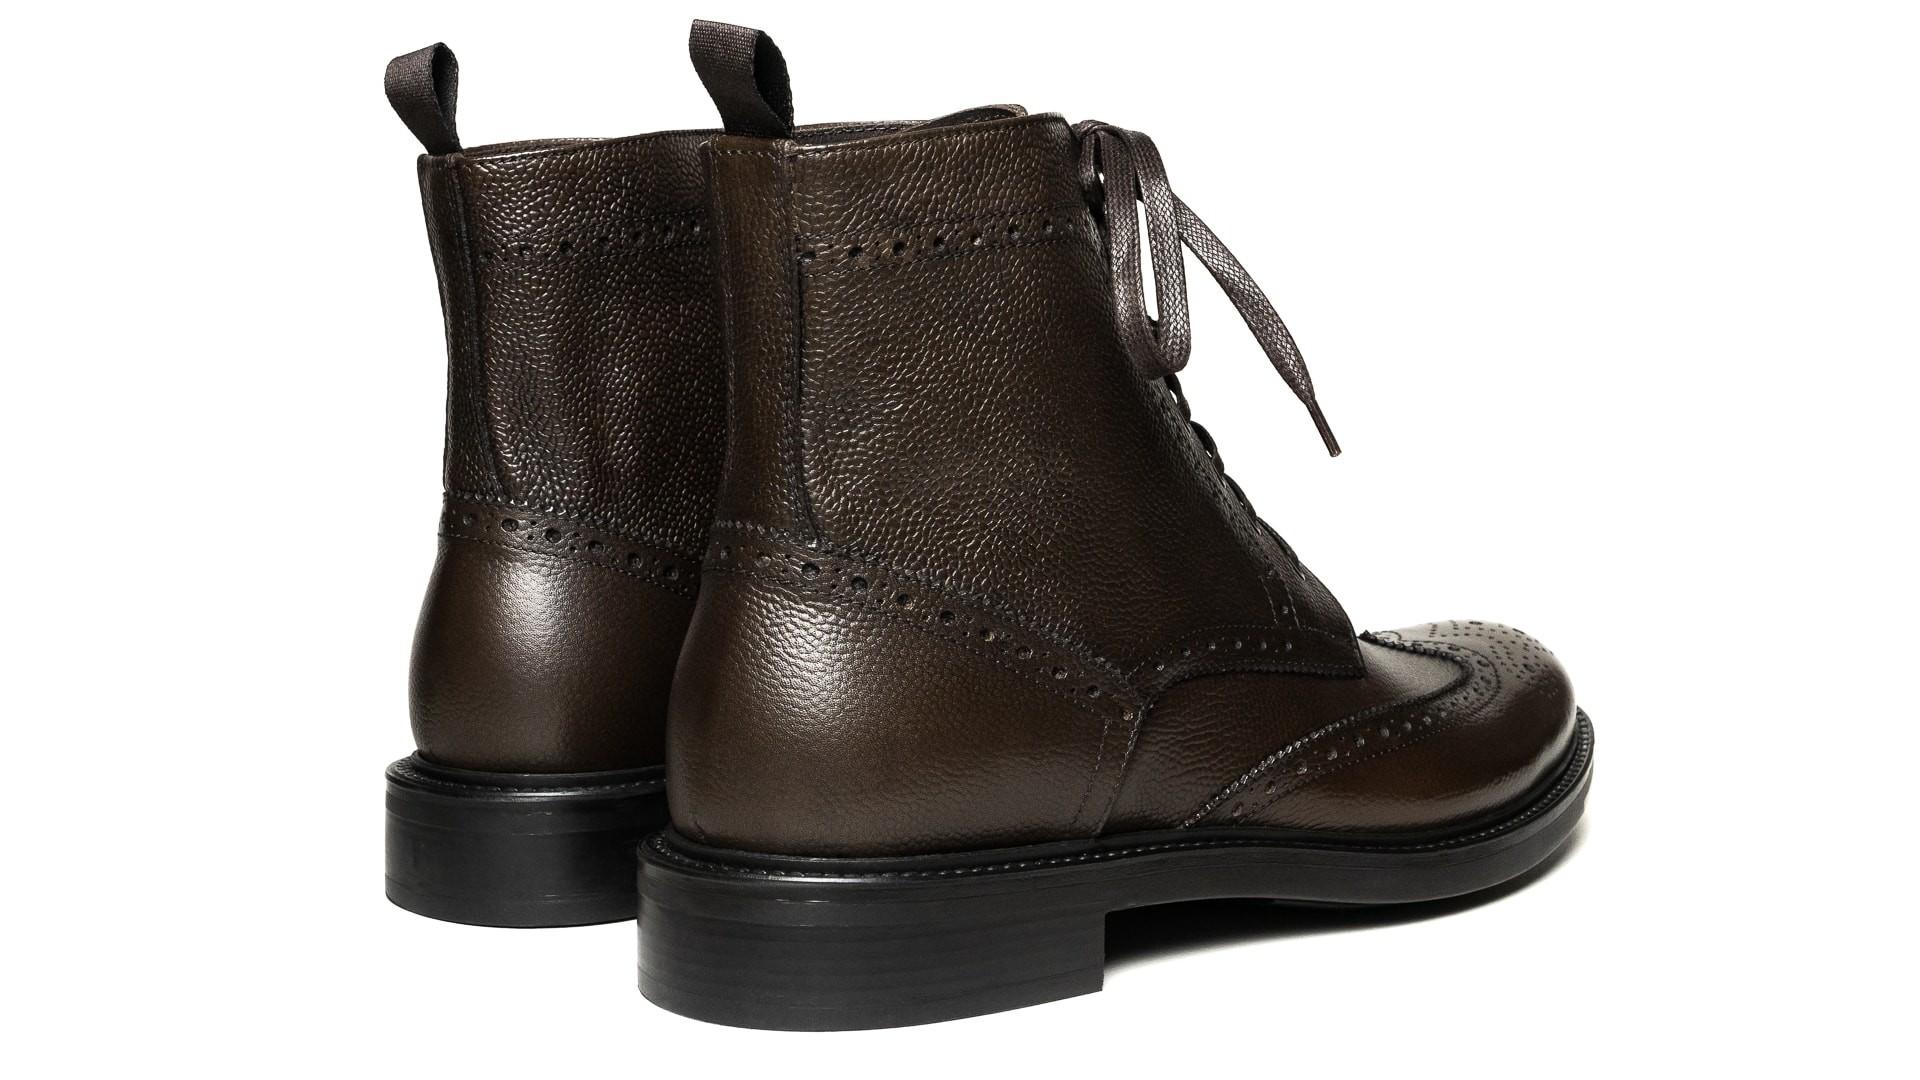 Brogue Boots Scotch Grain Marrone